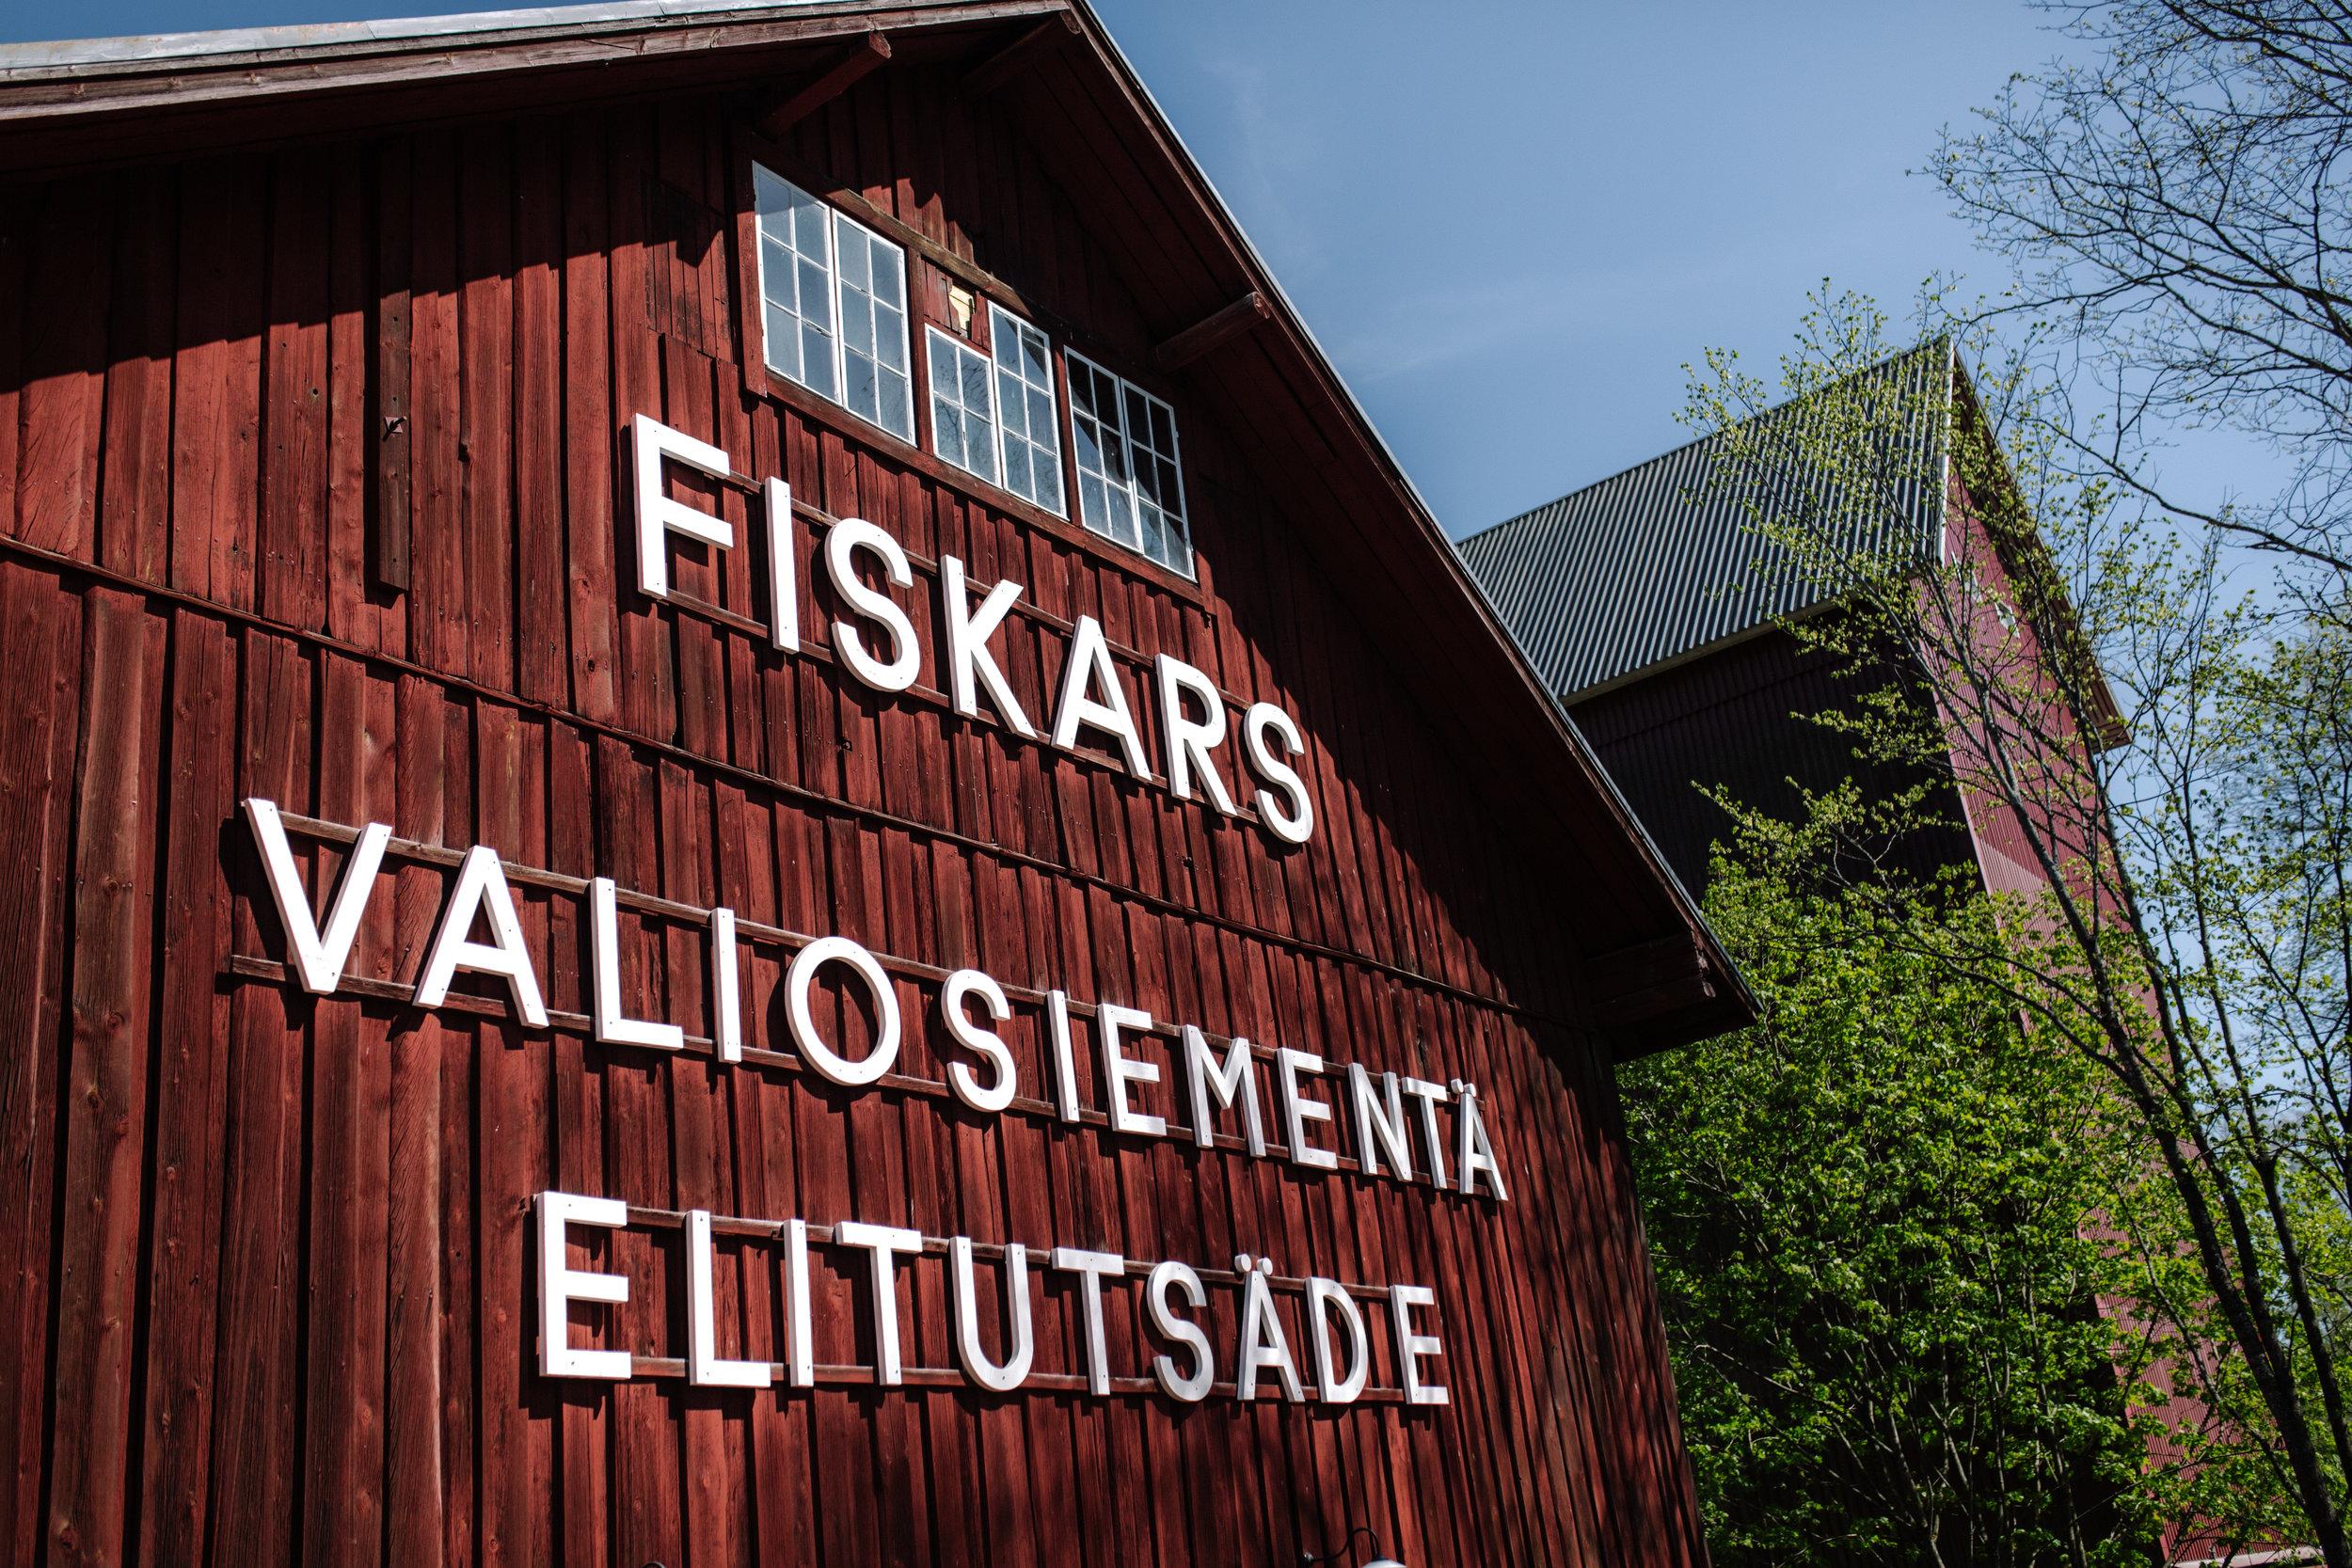 Finland_0519_0083.JPG